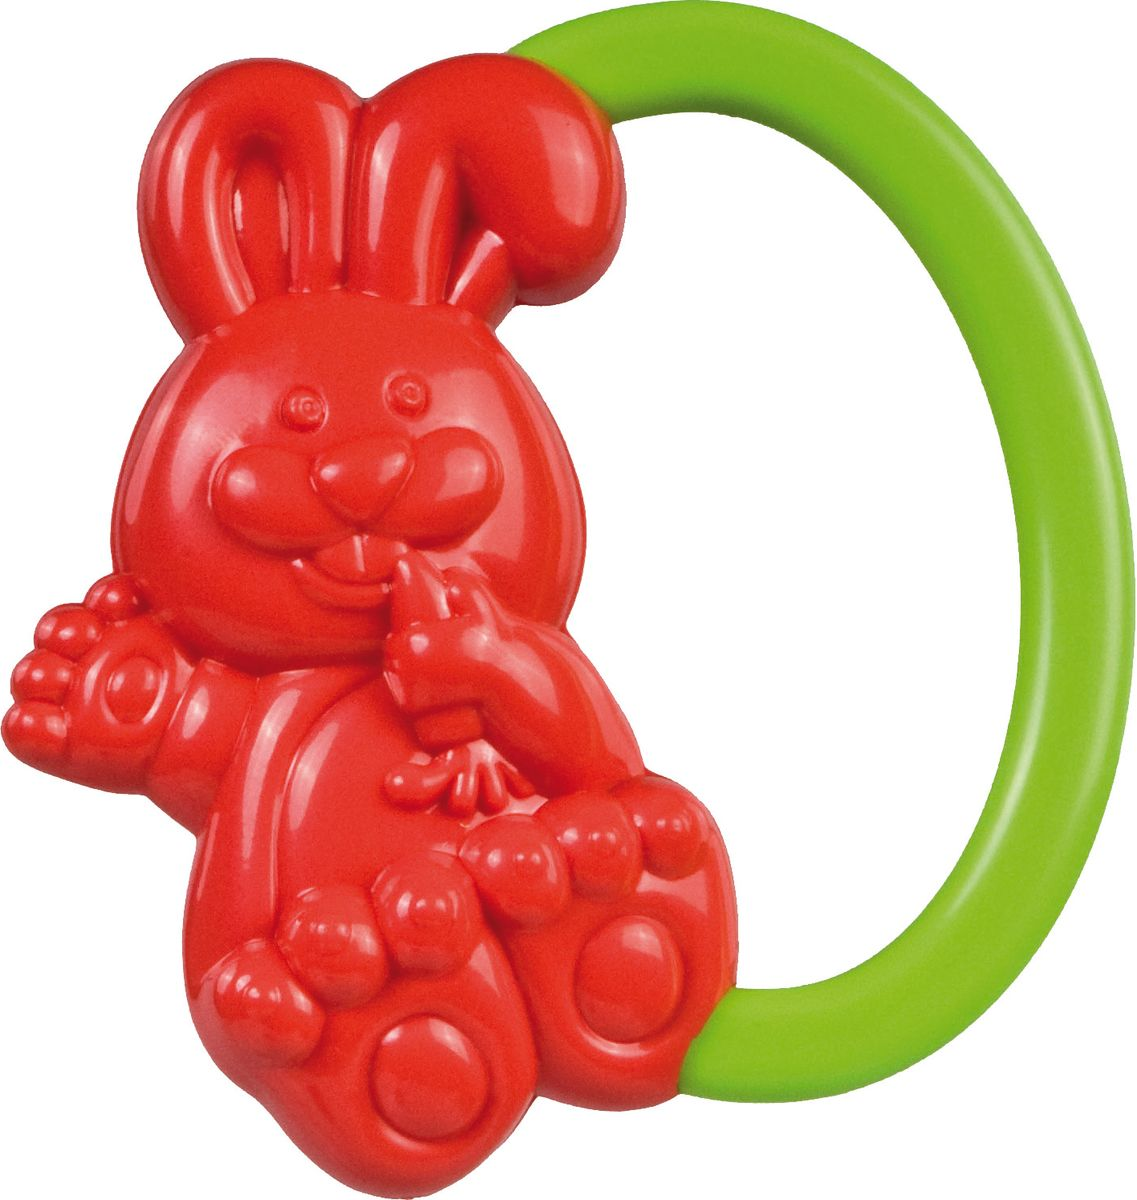 Canpol Babies Погремушка Кролик цвет красный canpol babies погремушка улитка 0 canpol babies зеленый